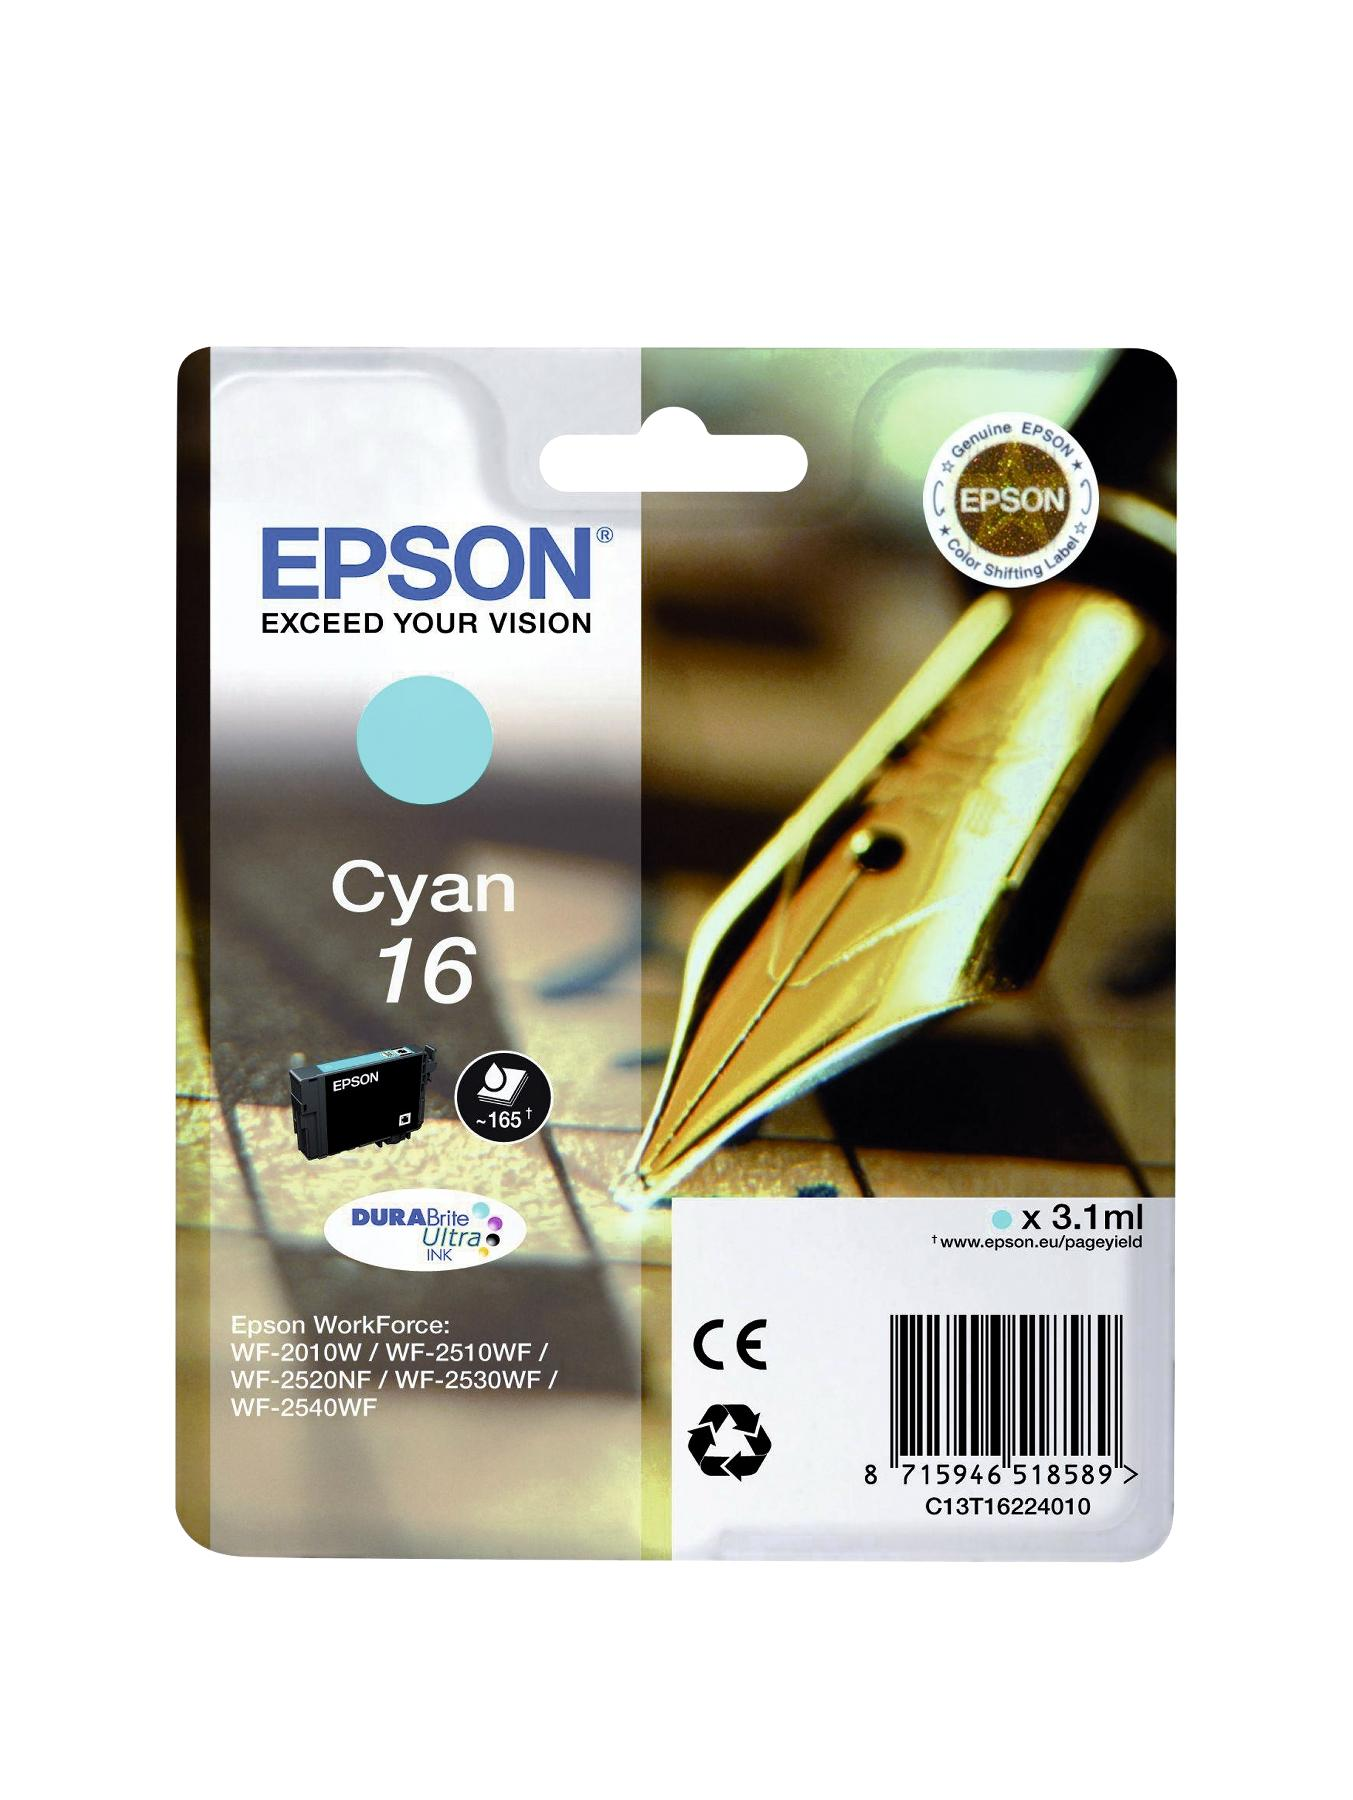 Epson Singlepack Cyan 16 DURABrite Ultra Ink